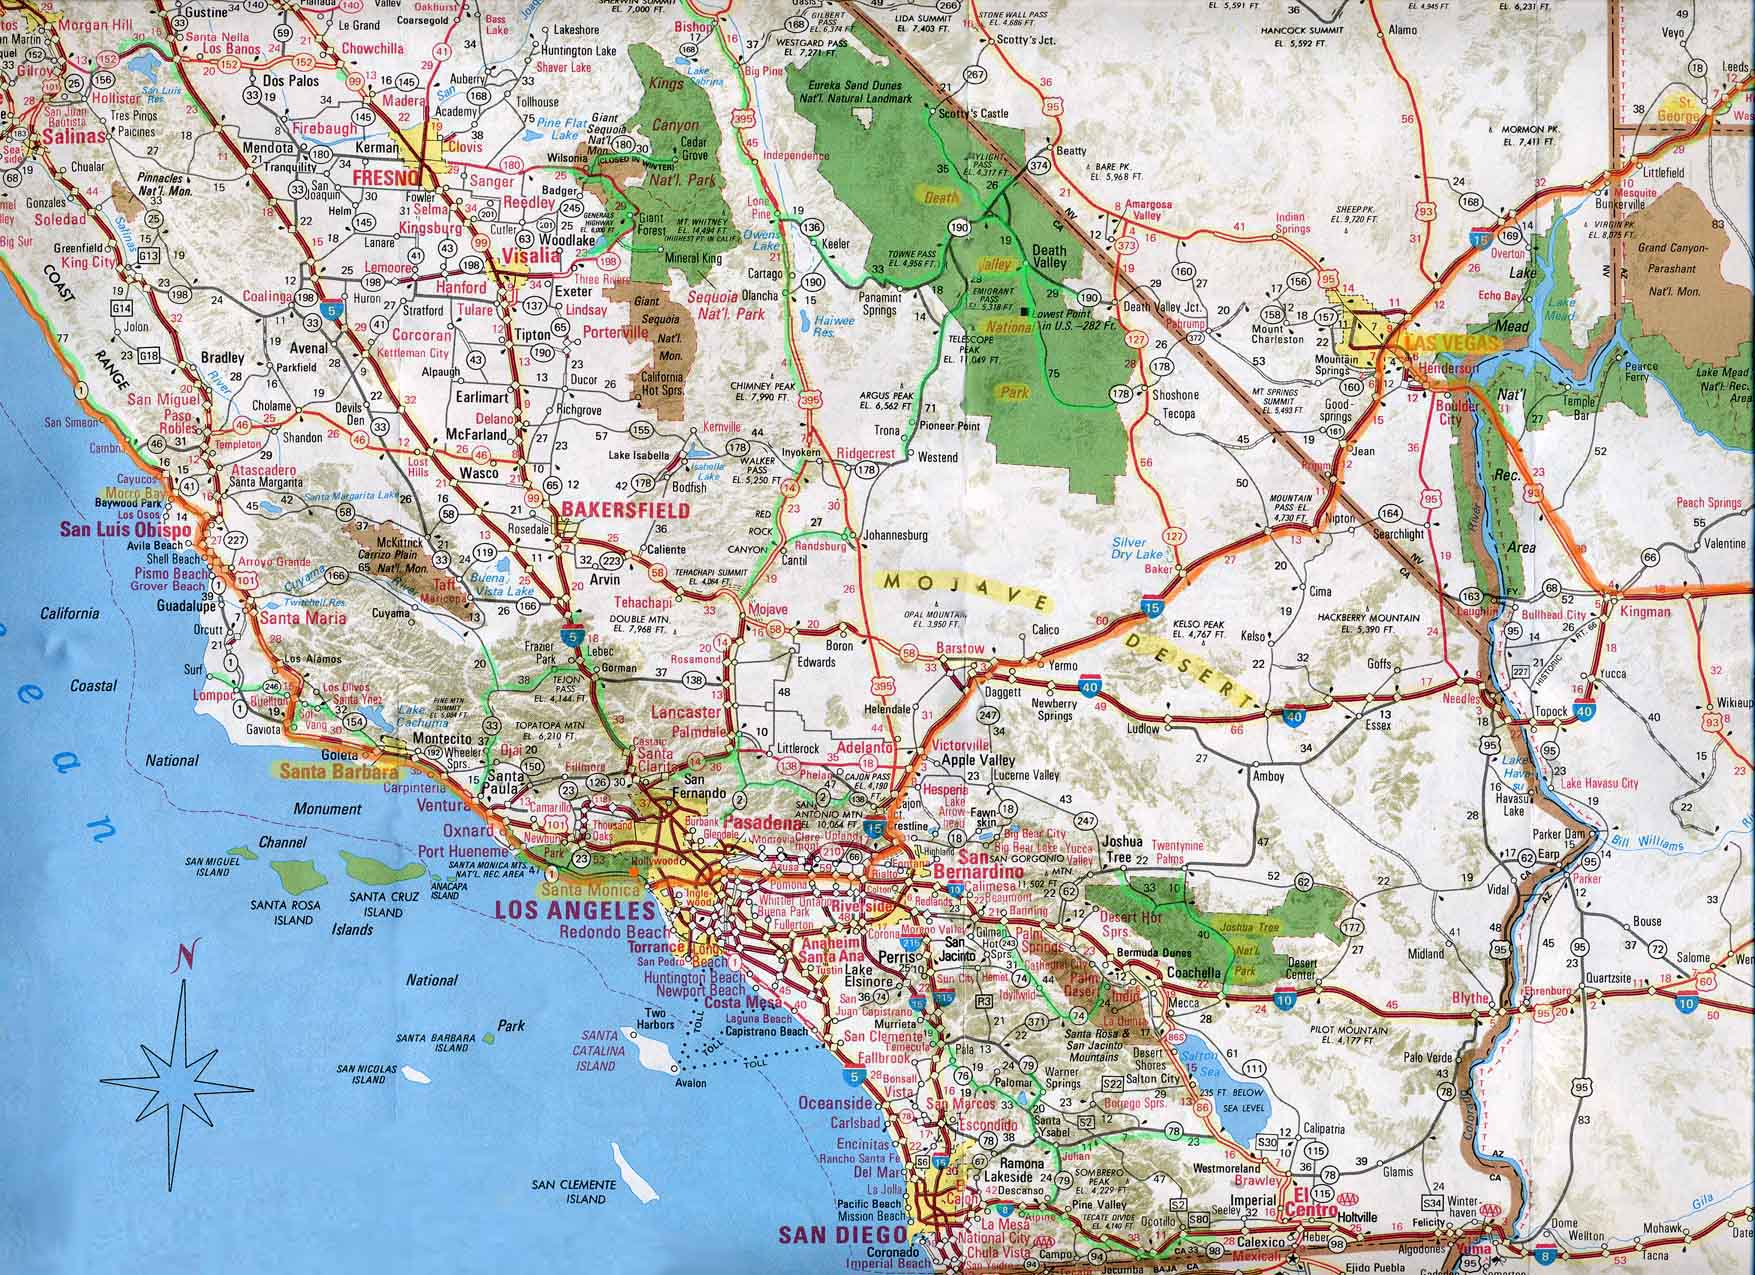 Southern California Map From Kolovrat 5 - Ameliabd - Detailed Map Of Southern California